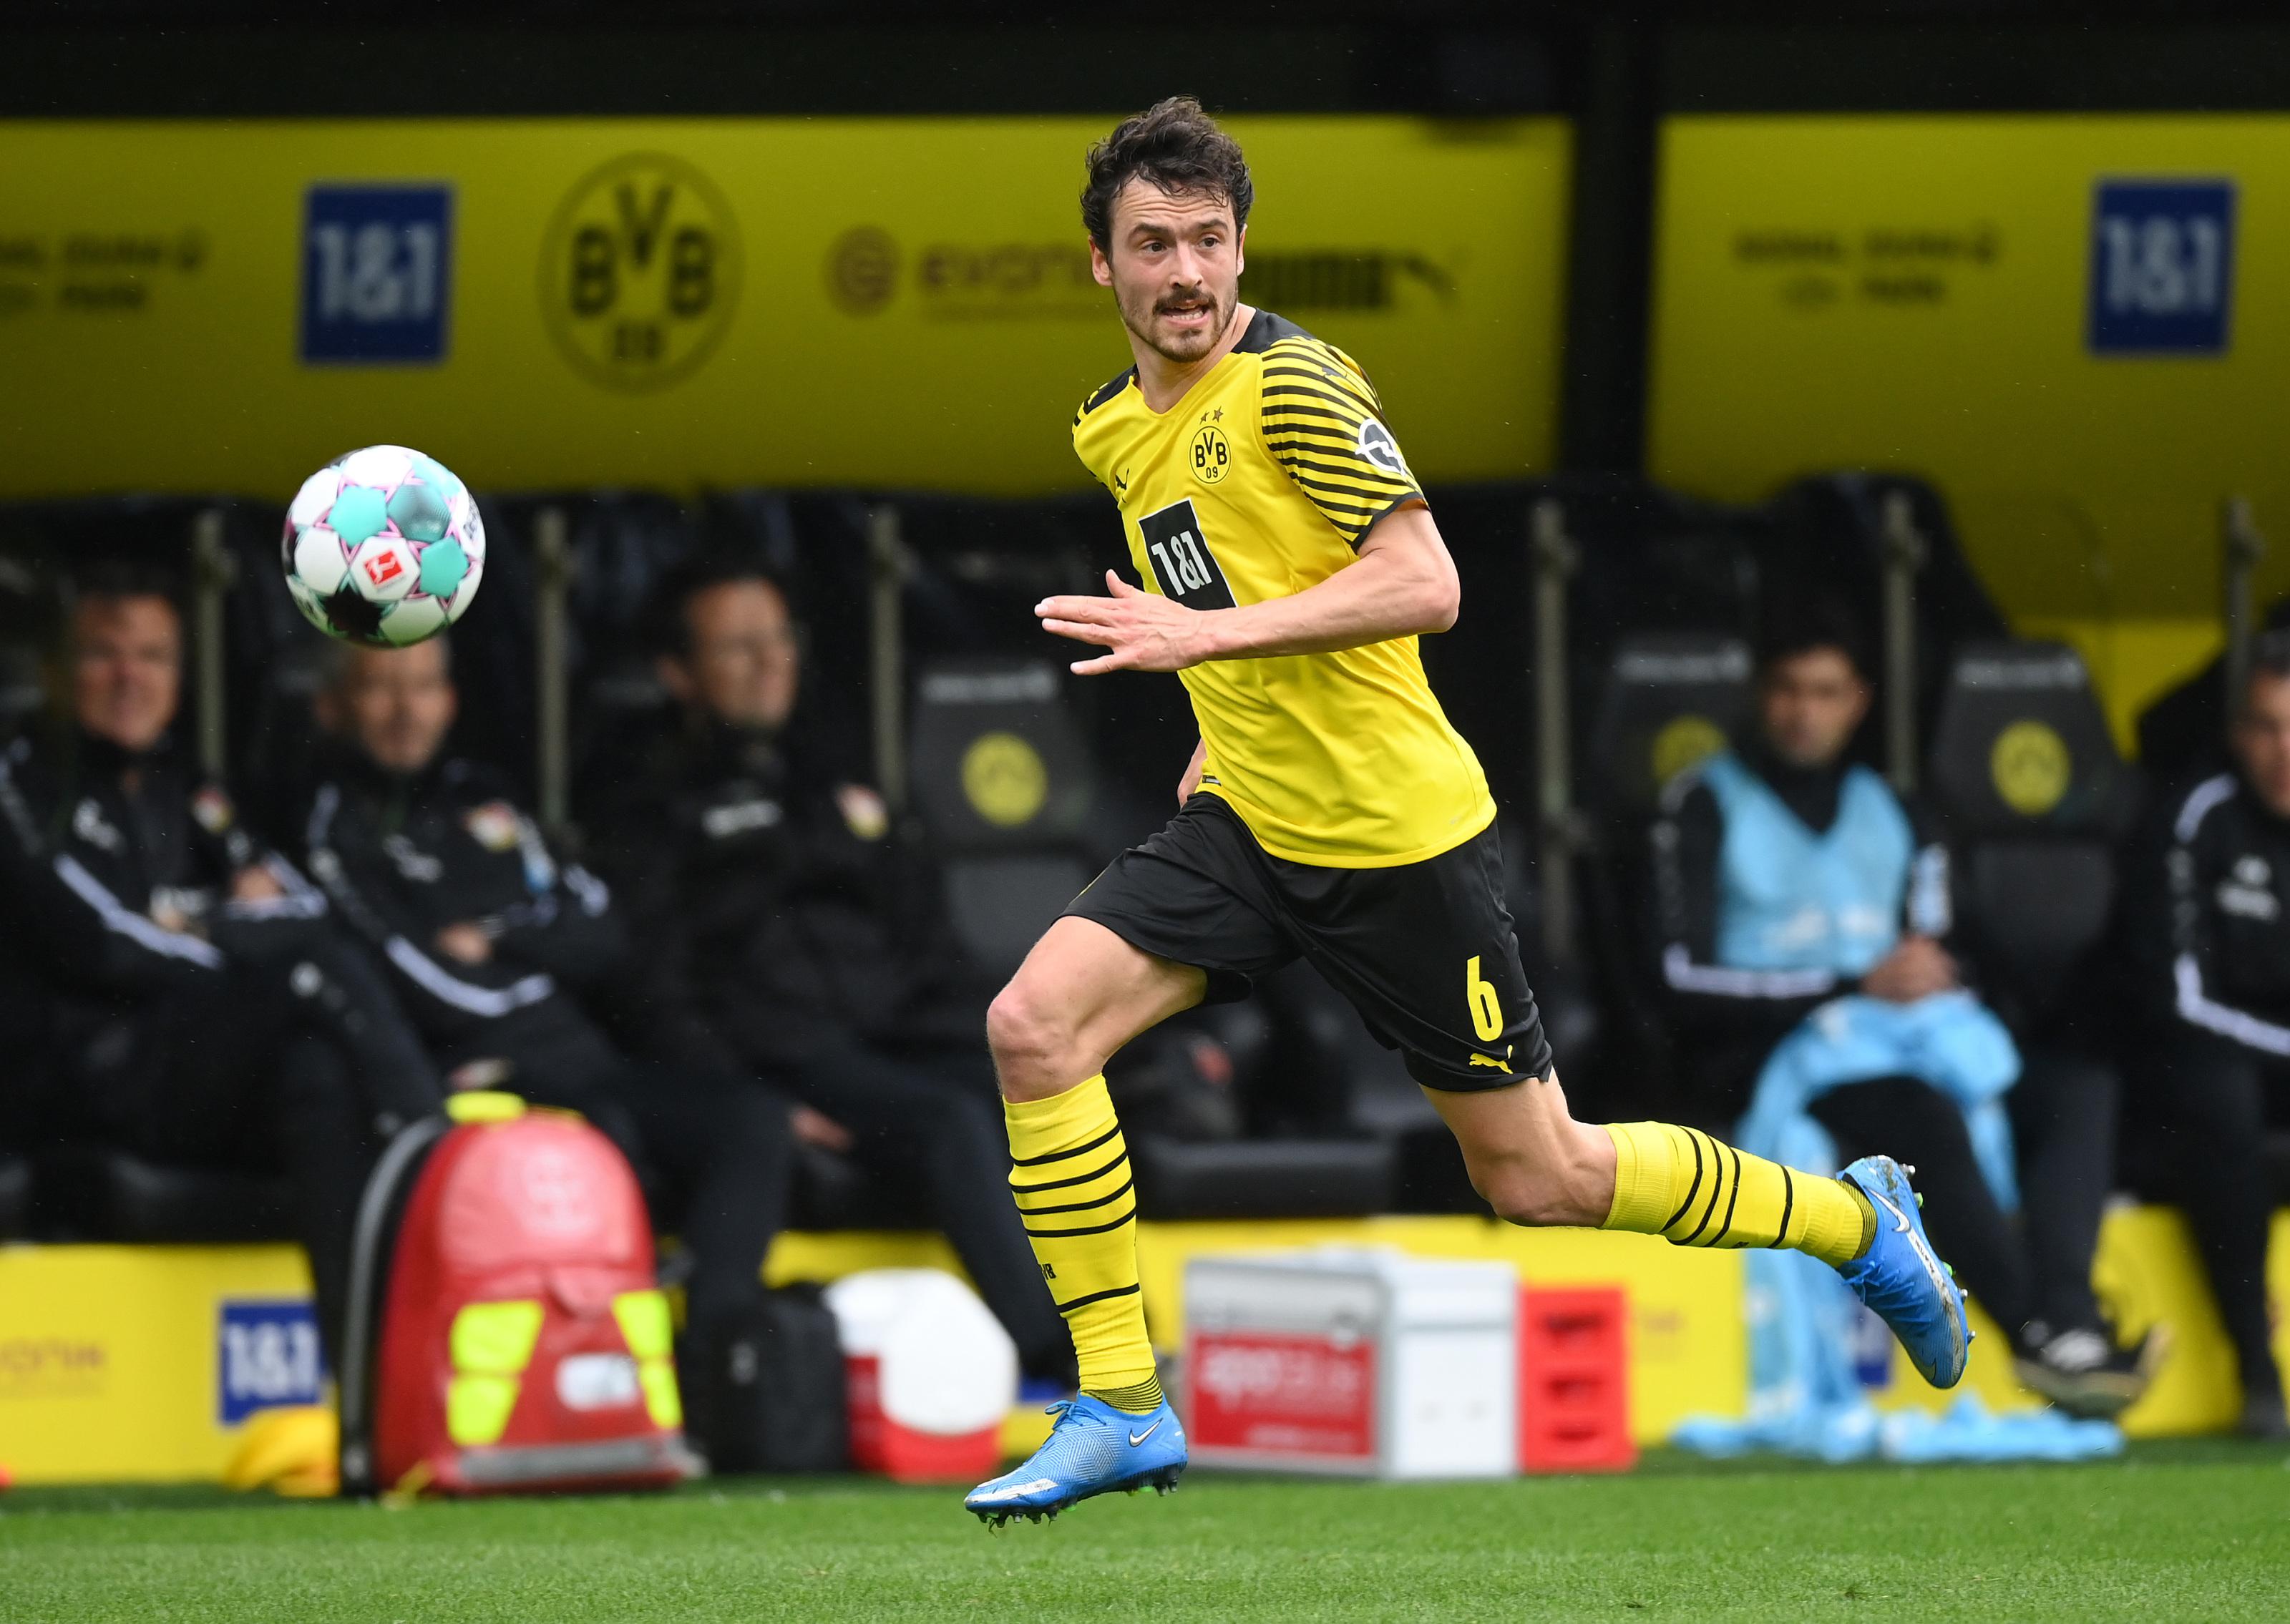 Thomas Delaney happy at Borussia Dortmund but leaves future open